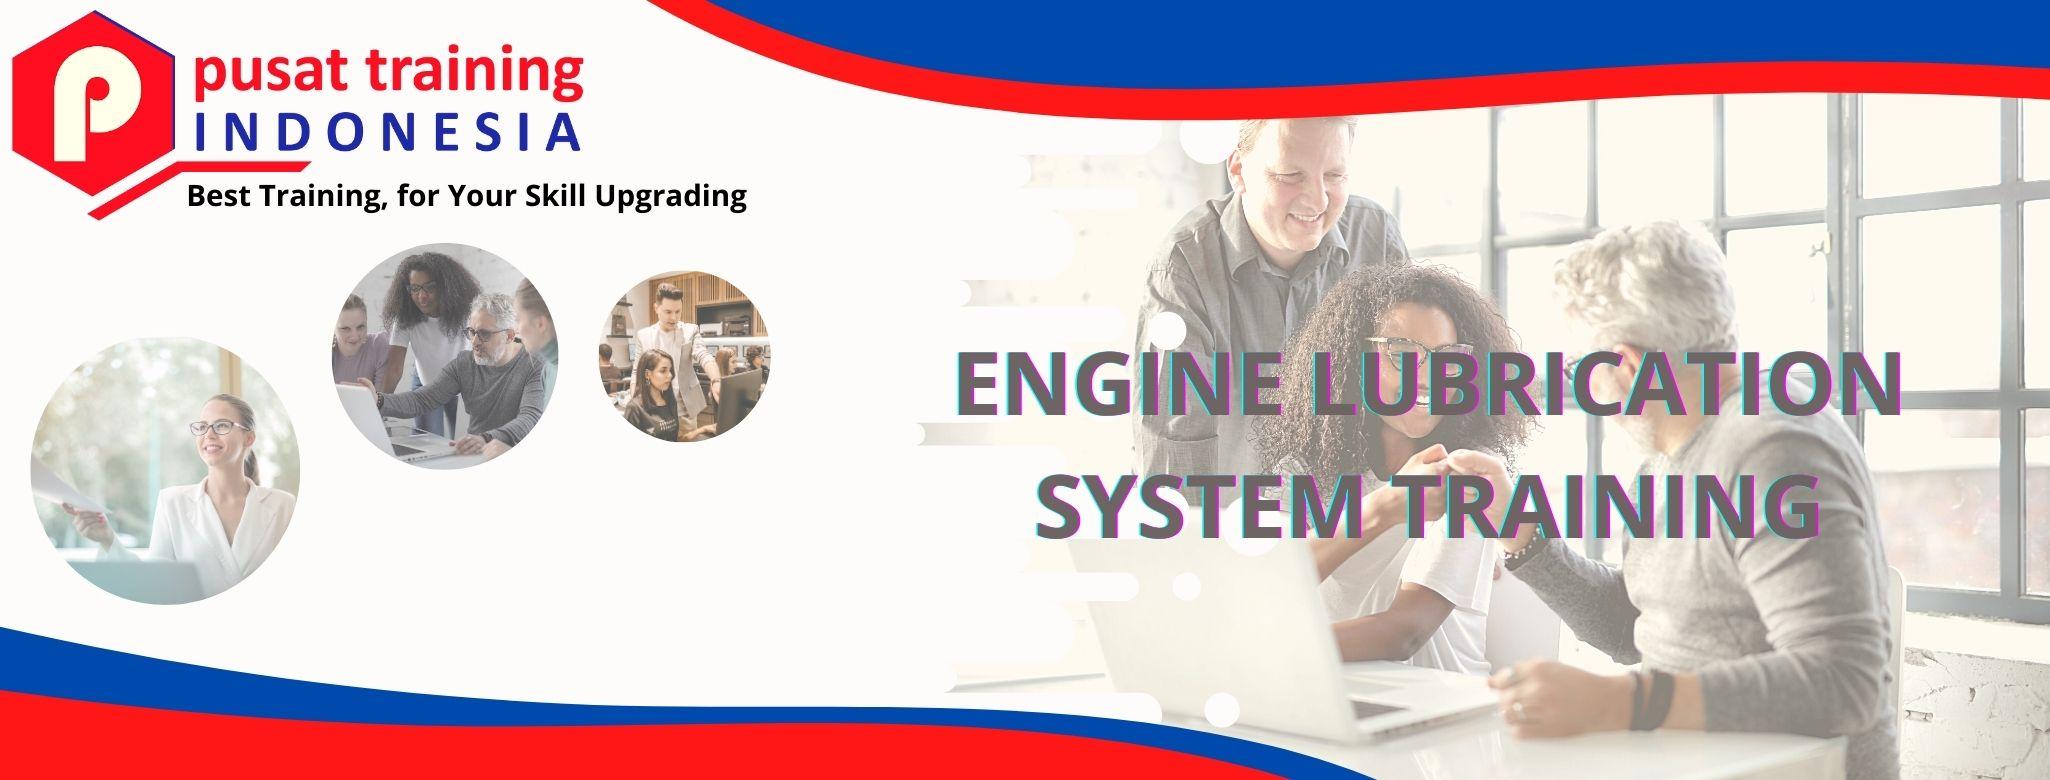 ENGINE LUBRICATION SYSTEM TRAINING